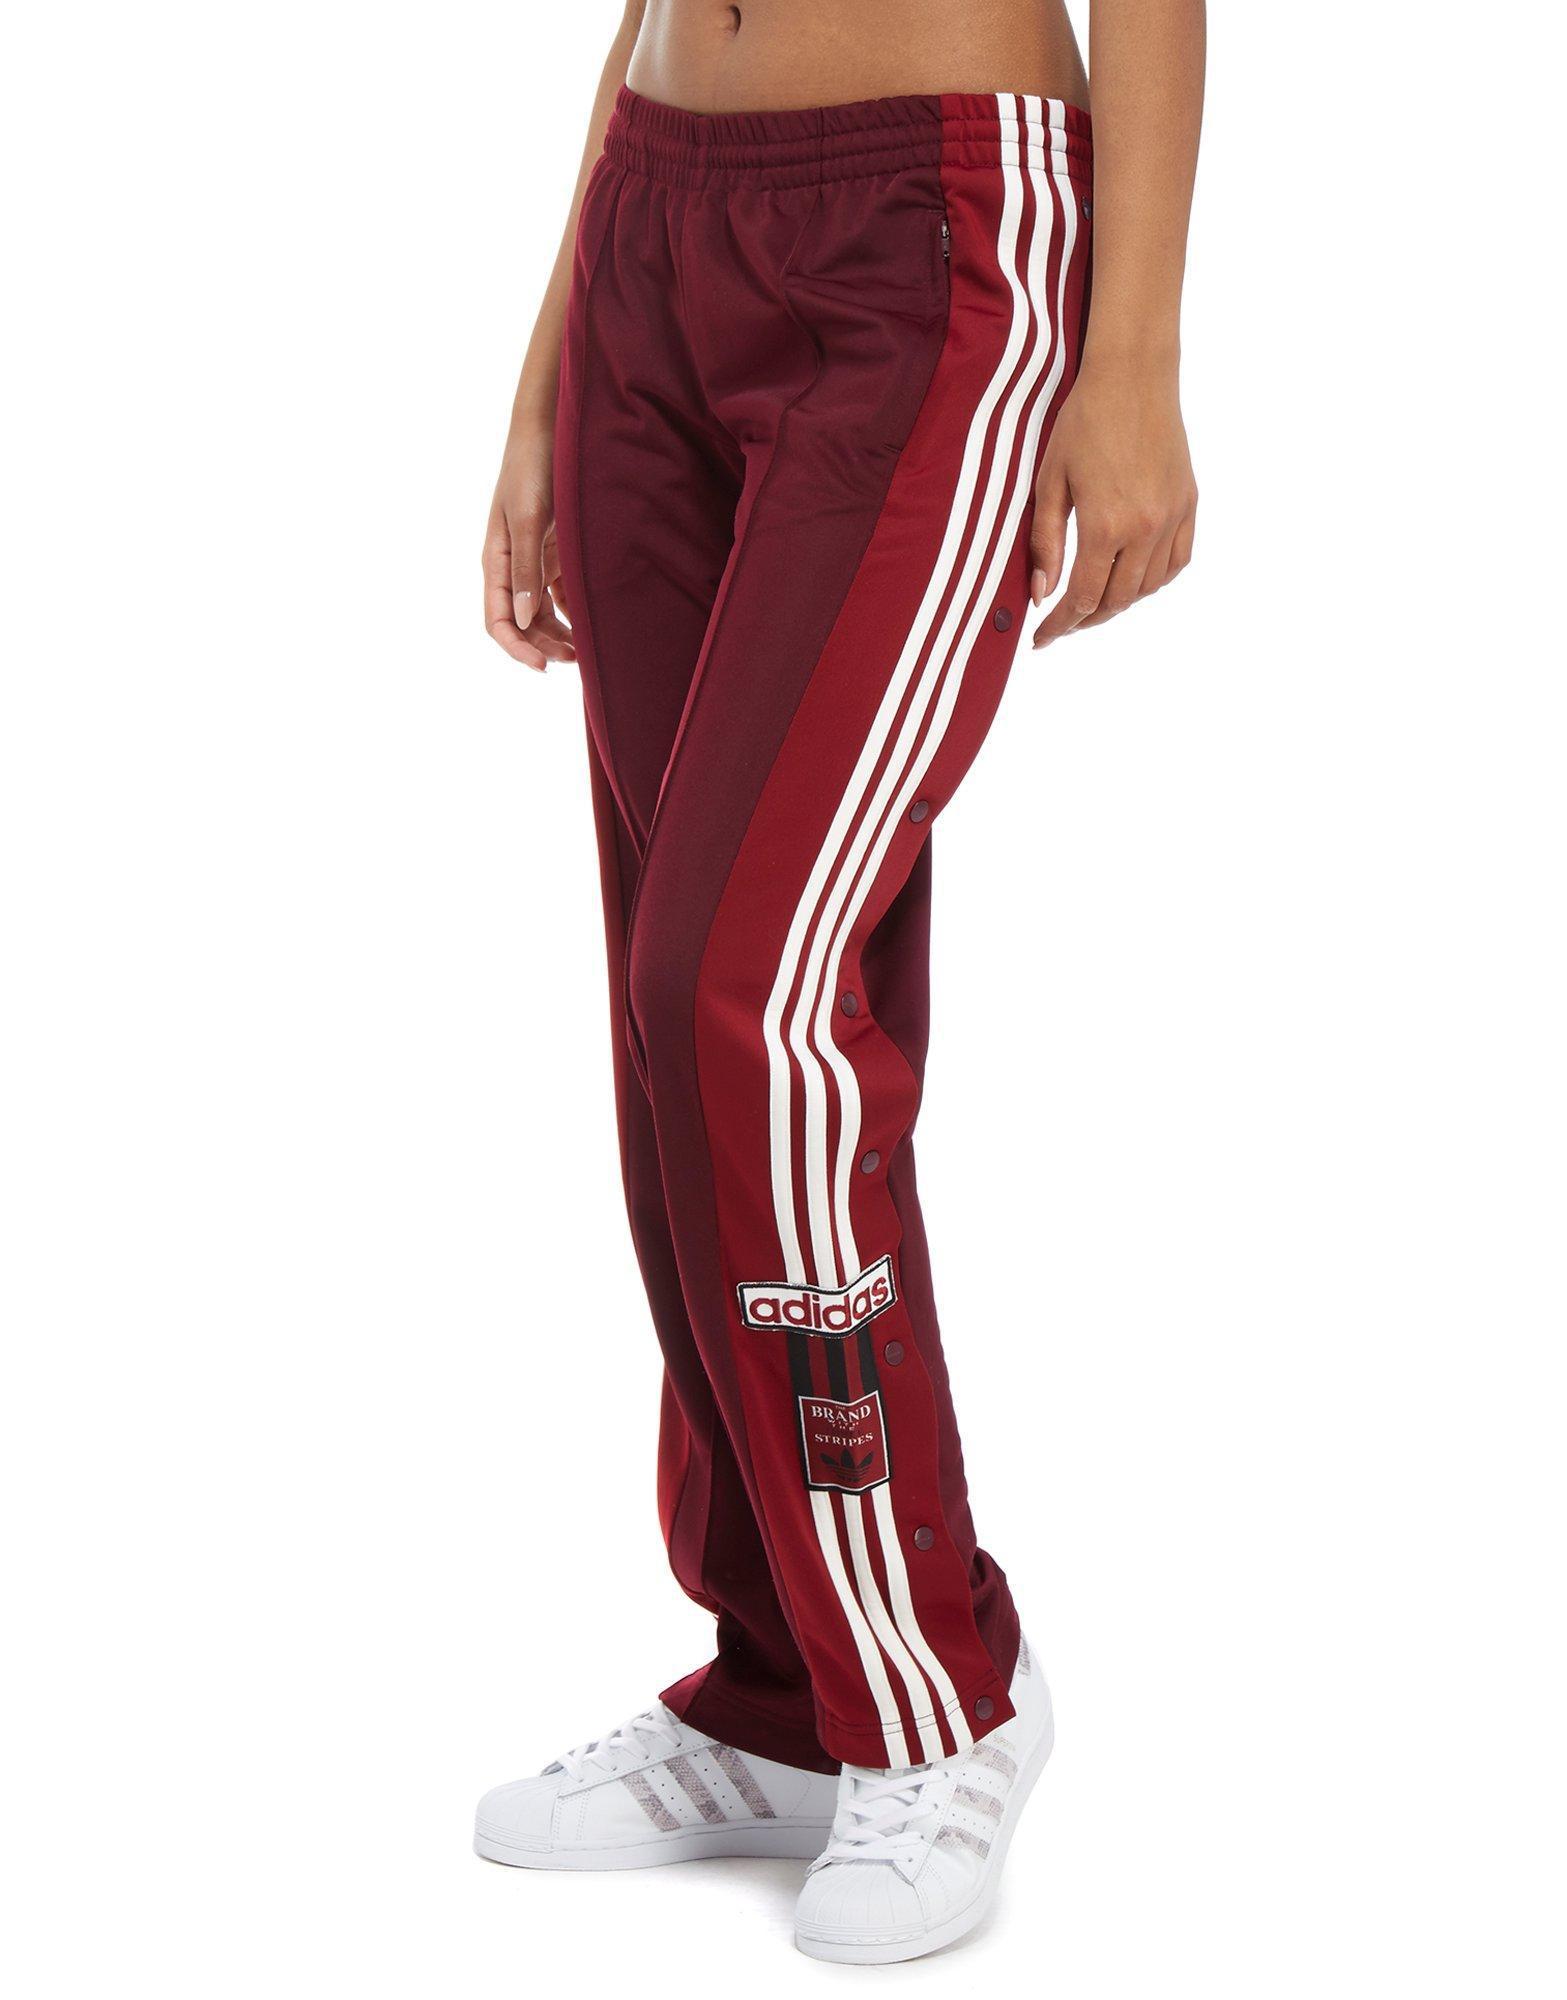 6a0ae226e adidas Originals Adibreak Popper Pants in Red - Lyst